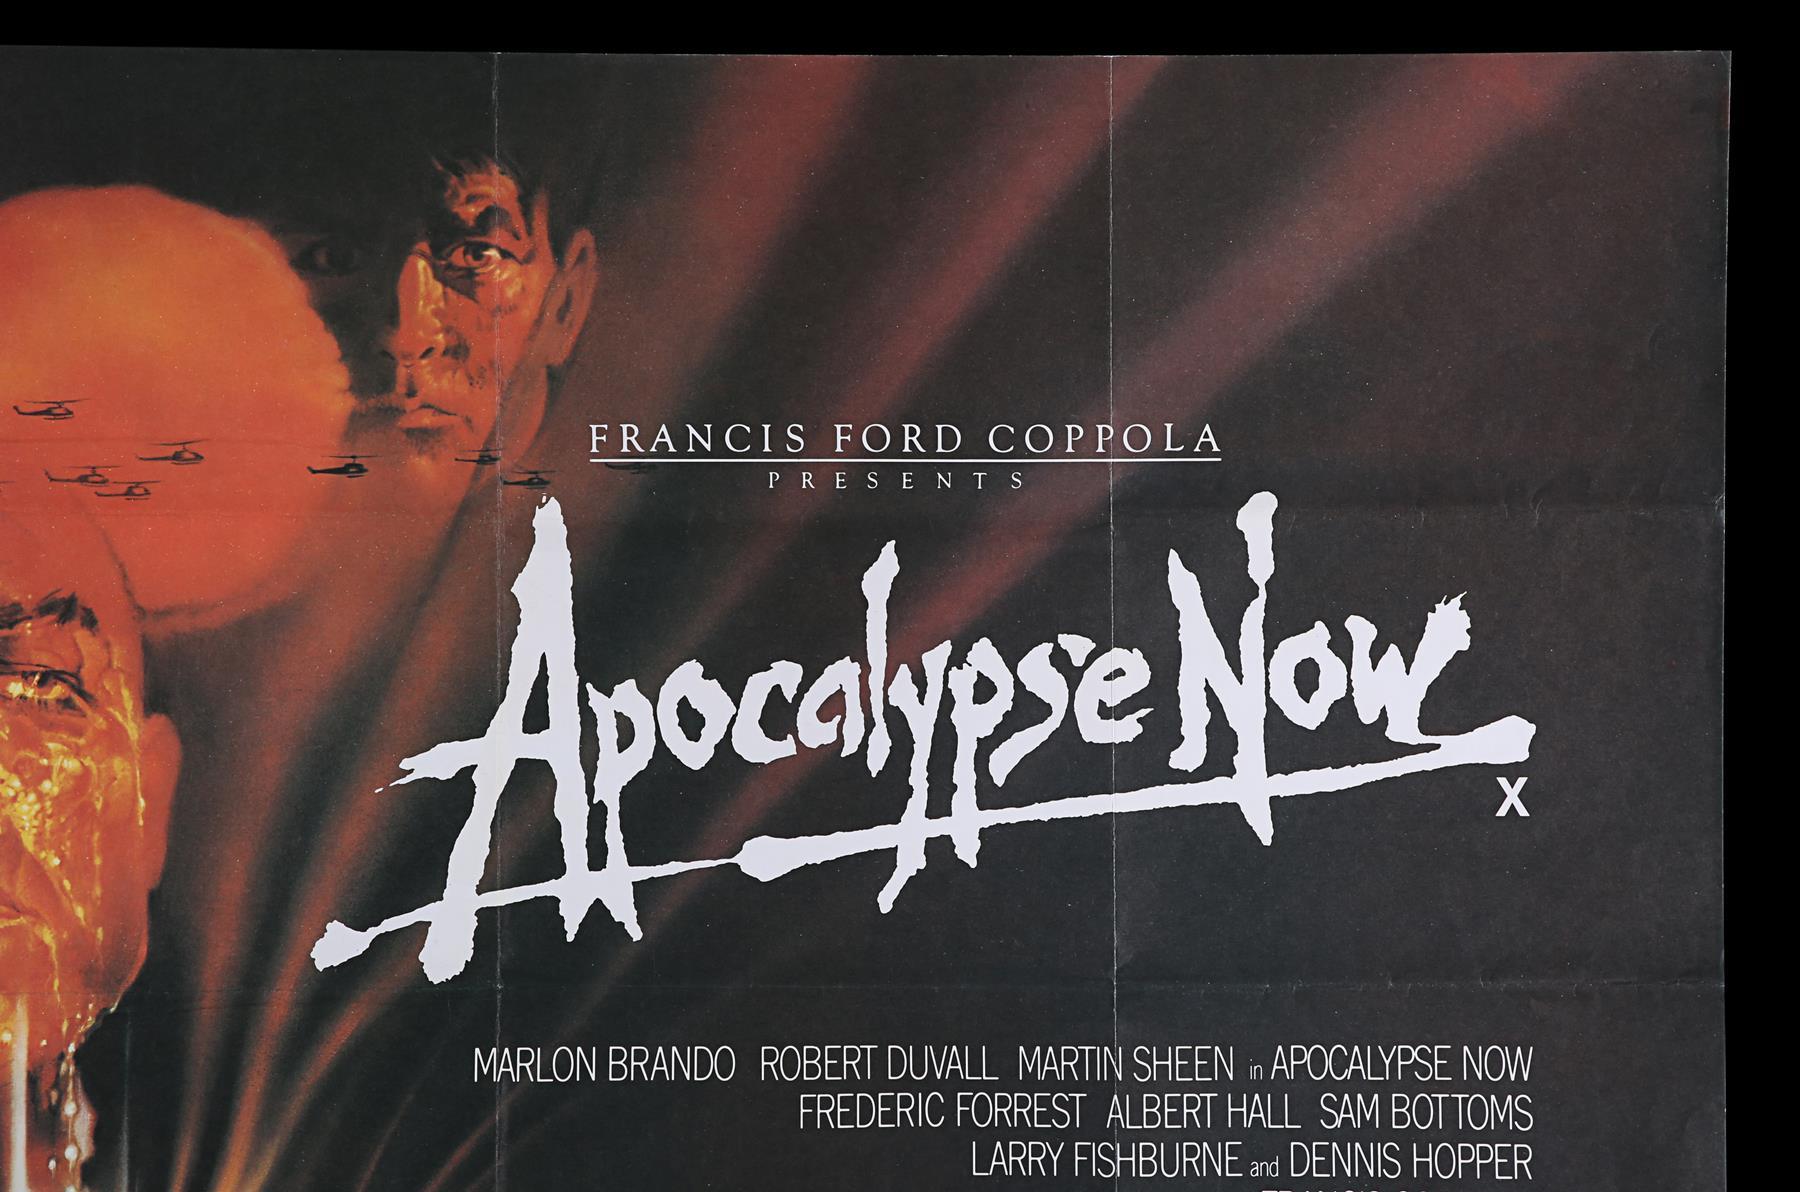 APOCALYPSE NOW (1979) - UK Quad, 1979 - Image 3 of 7